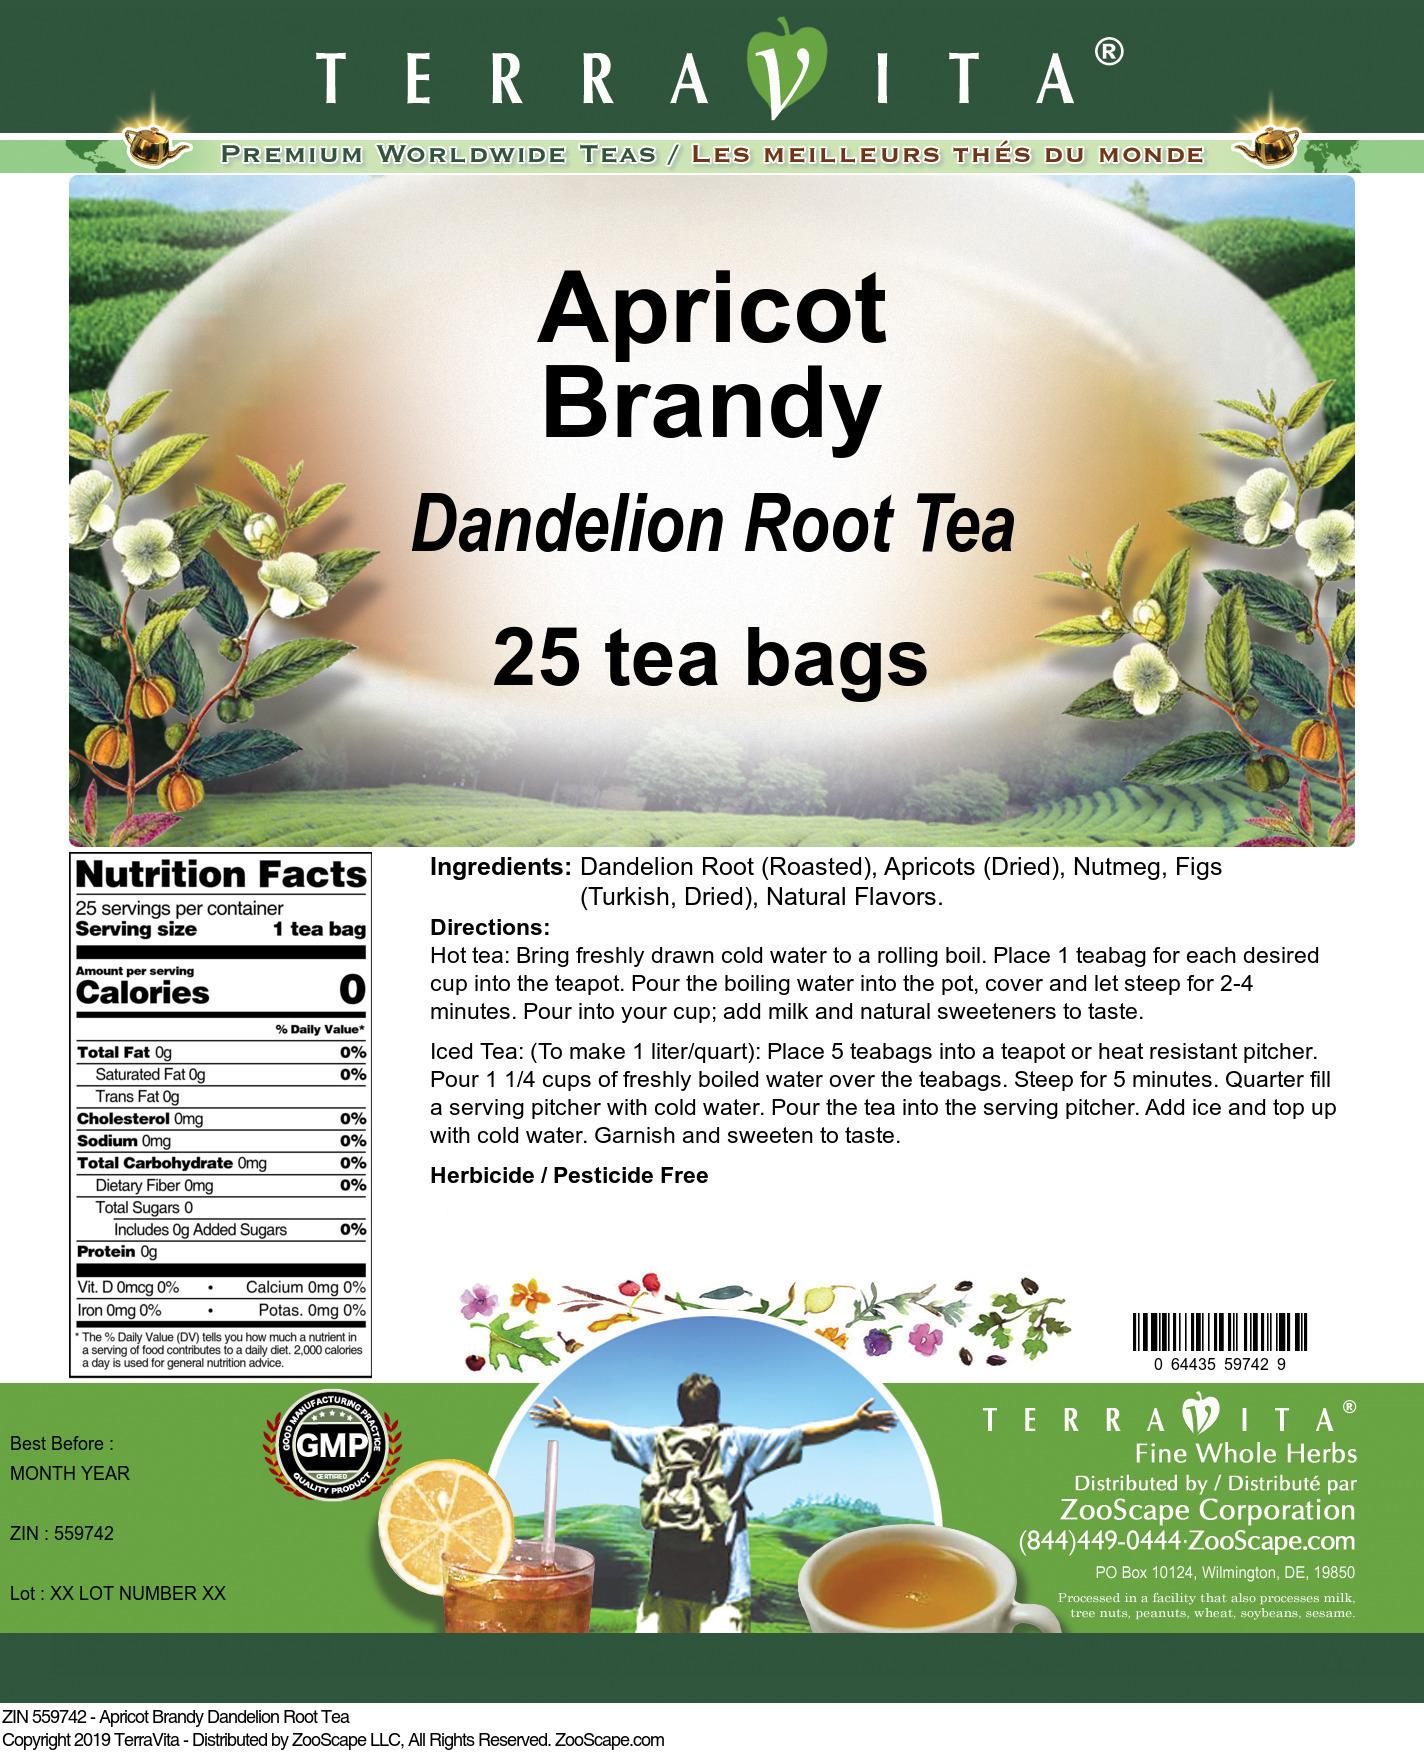 Apricot Brandy Dandelion Root Tea